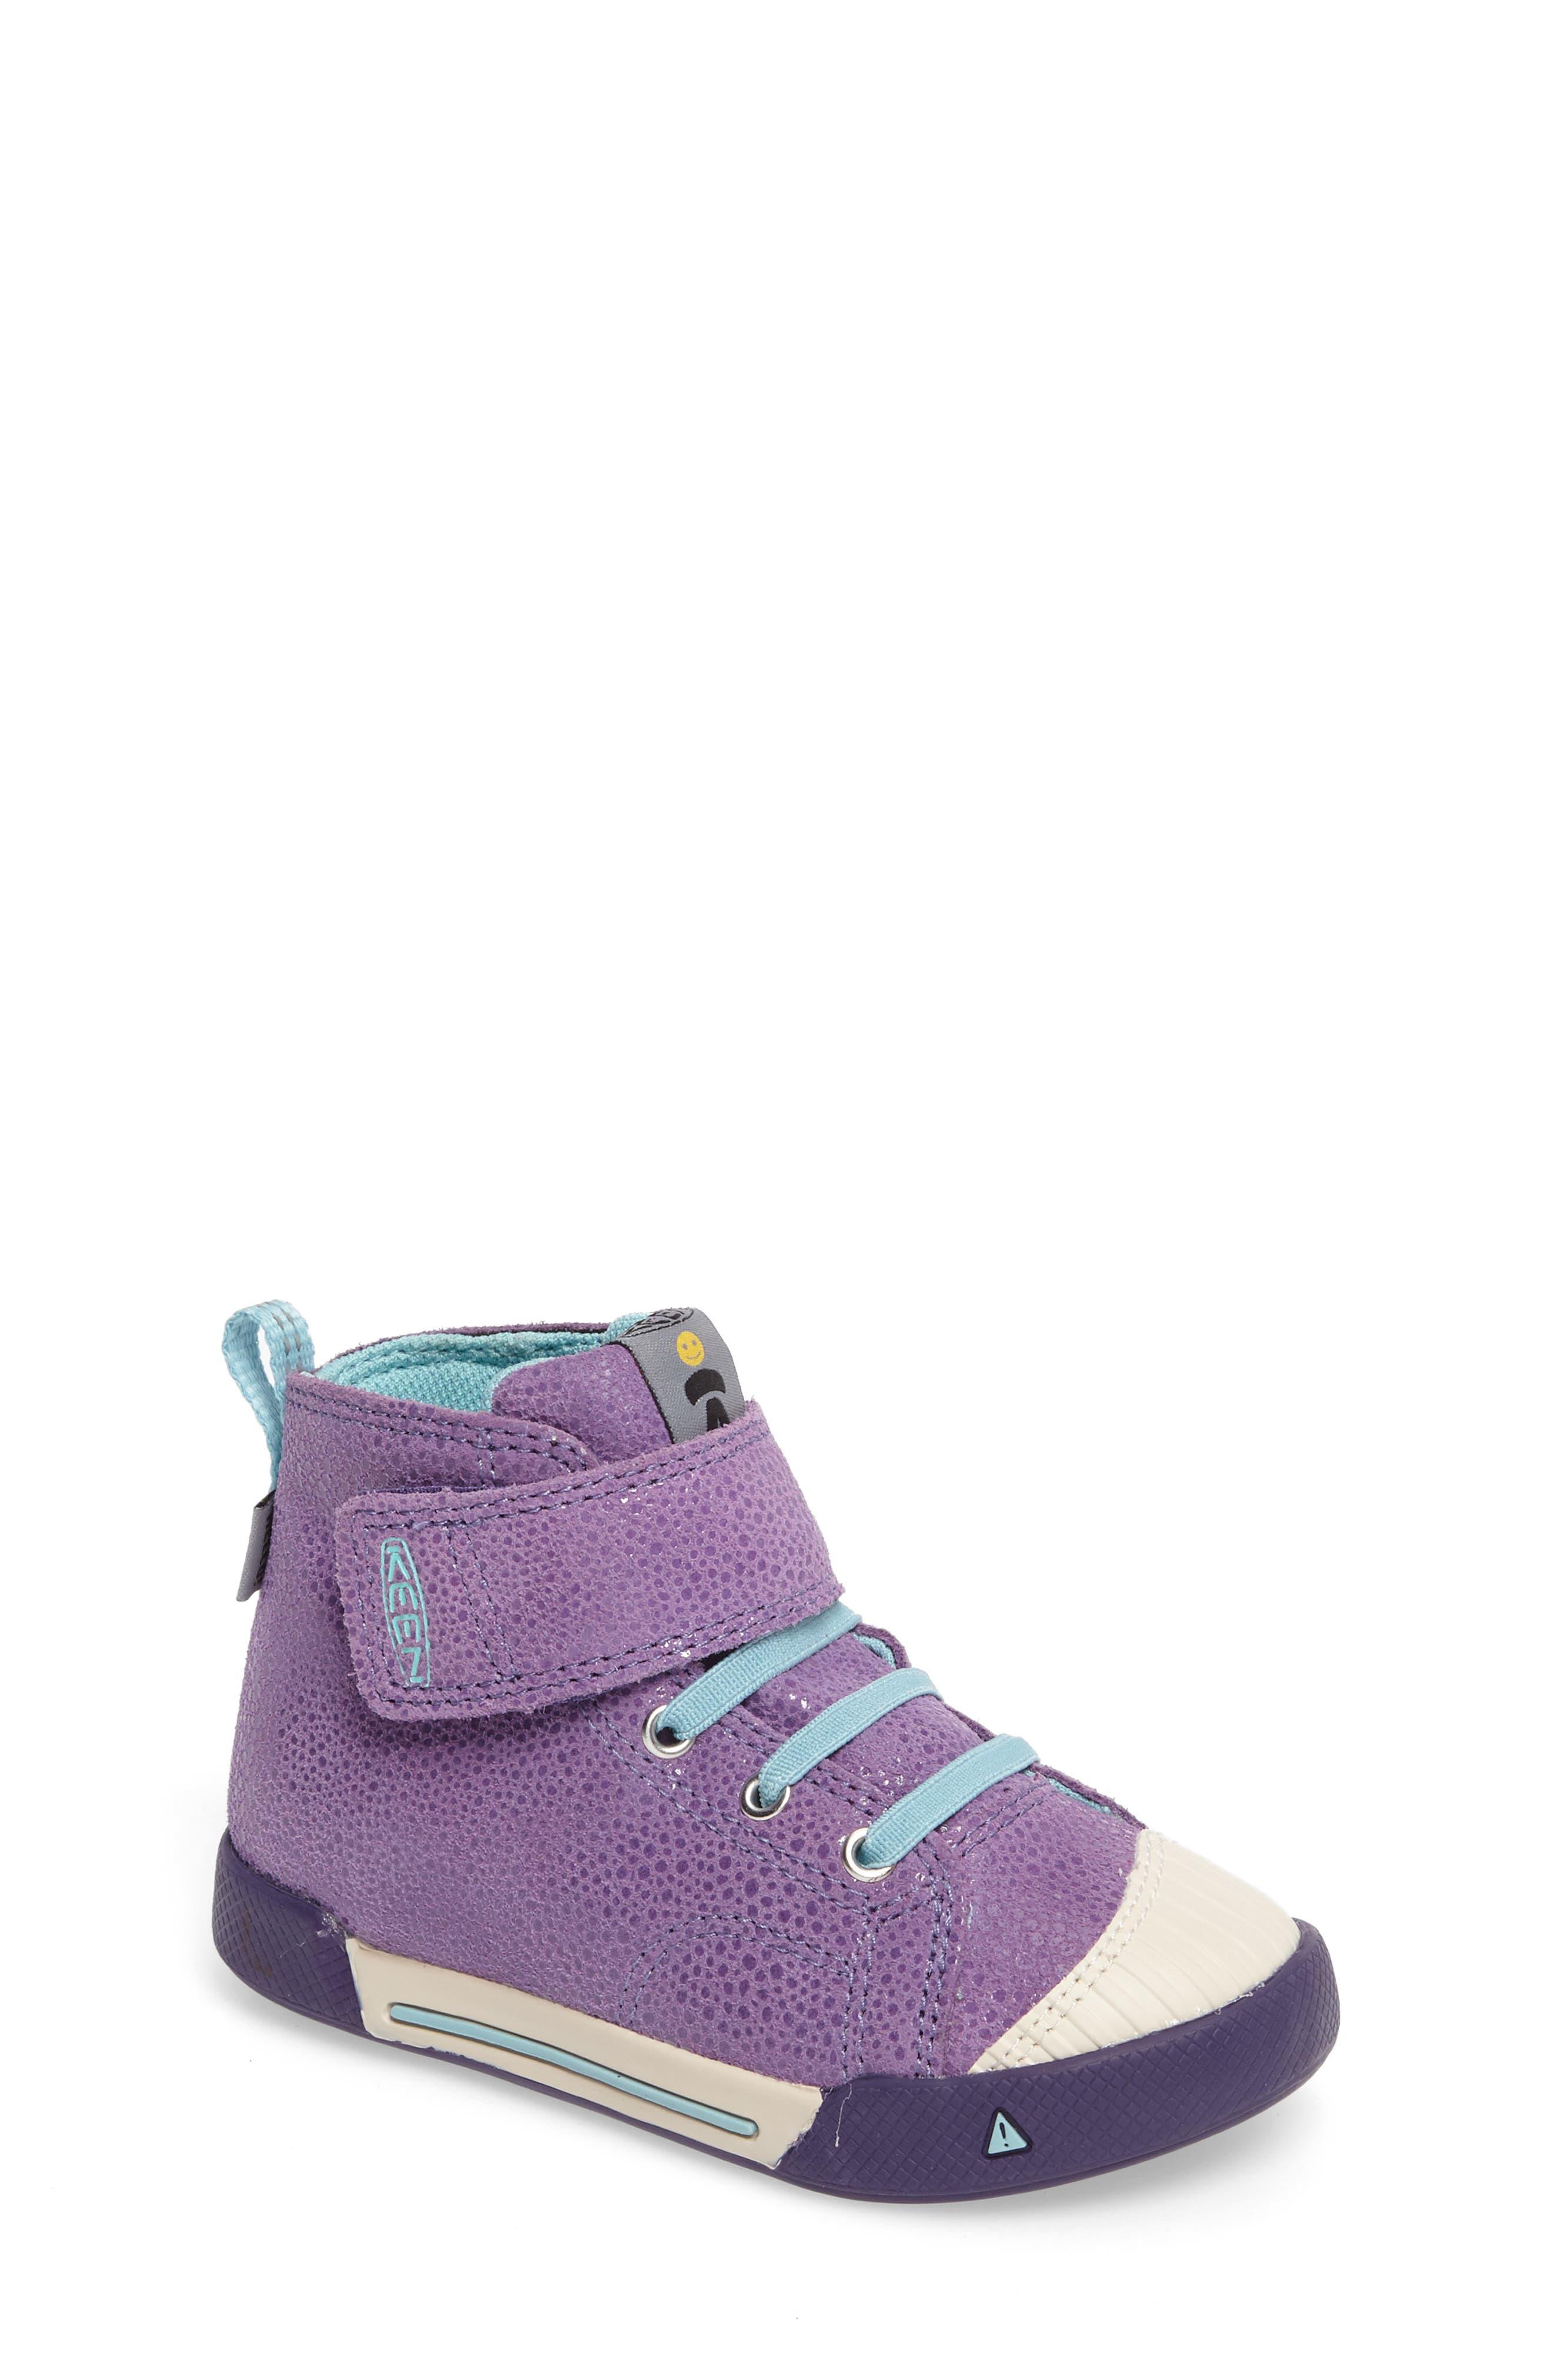 Main Image - Keen 'Encanto Scout' High Top Sneaker (Baby, Walker, Toddler & Little Kid)